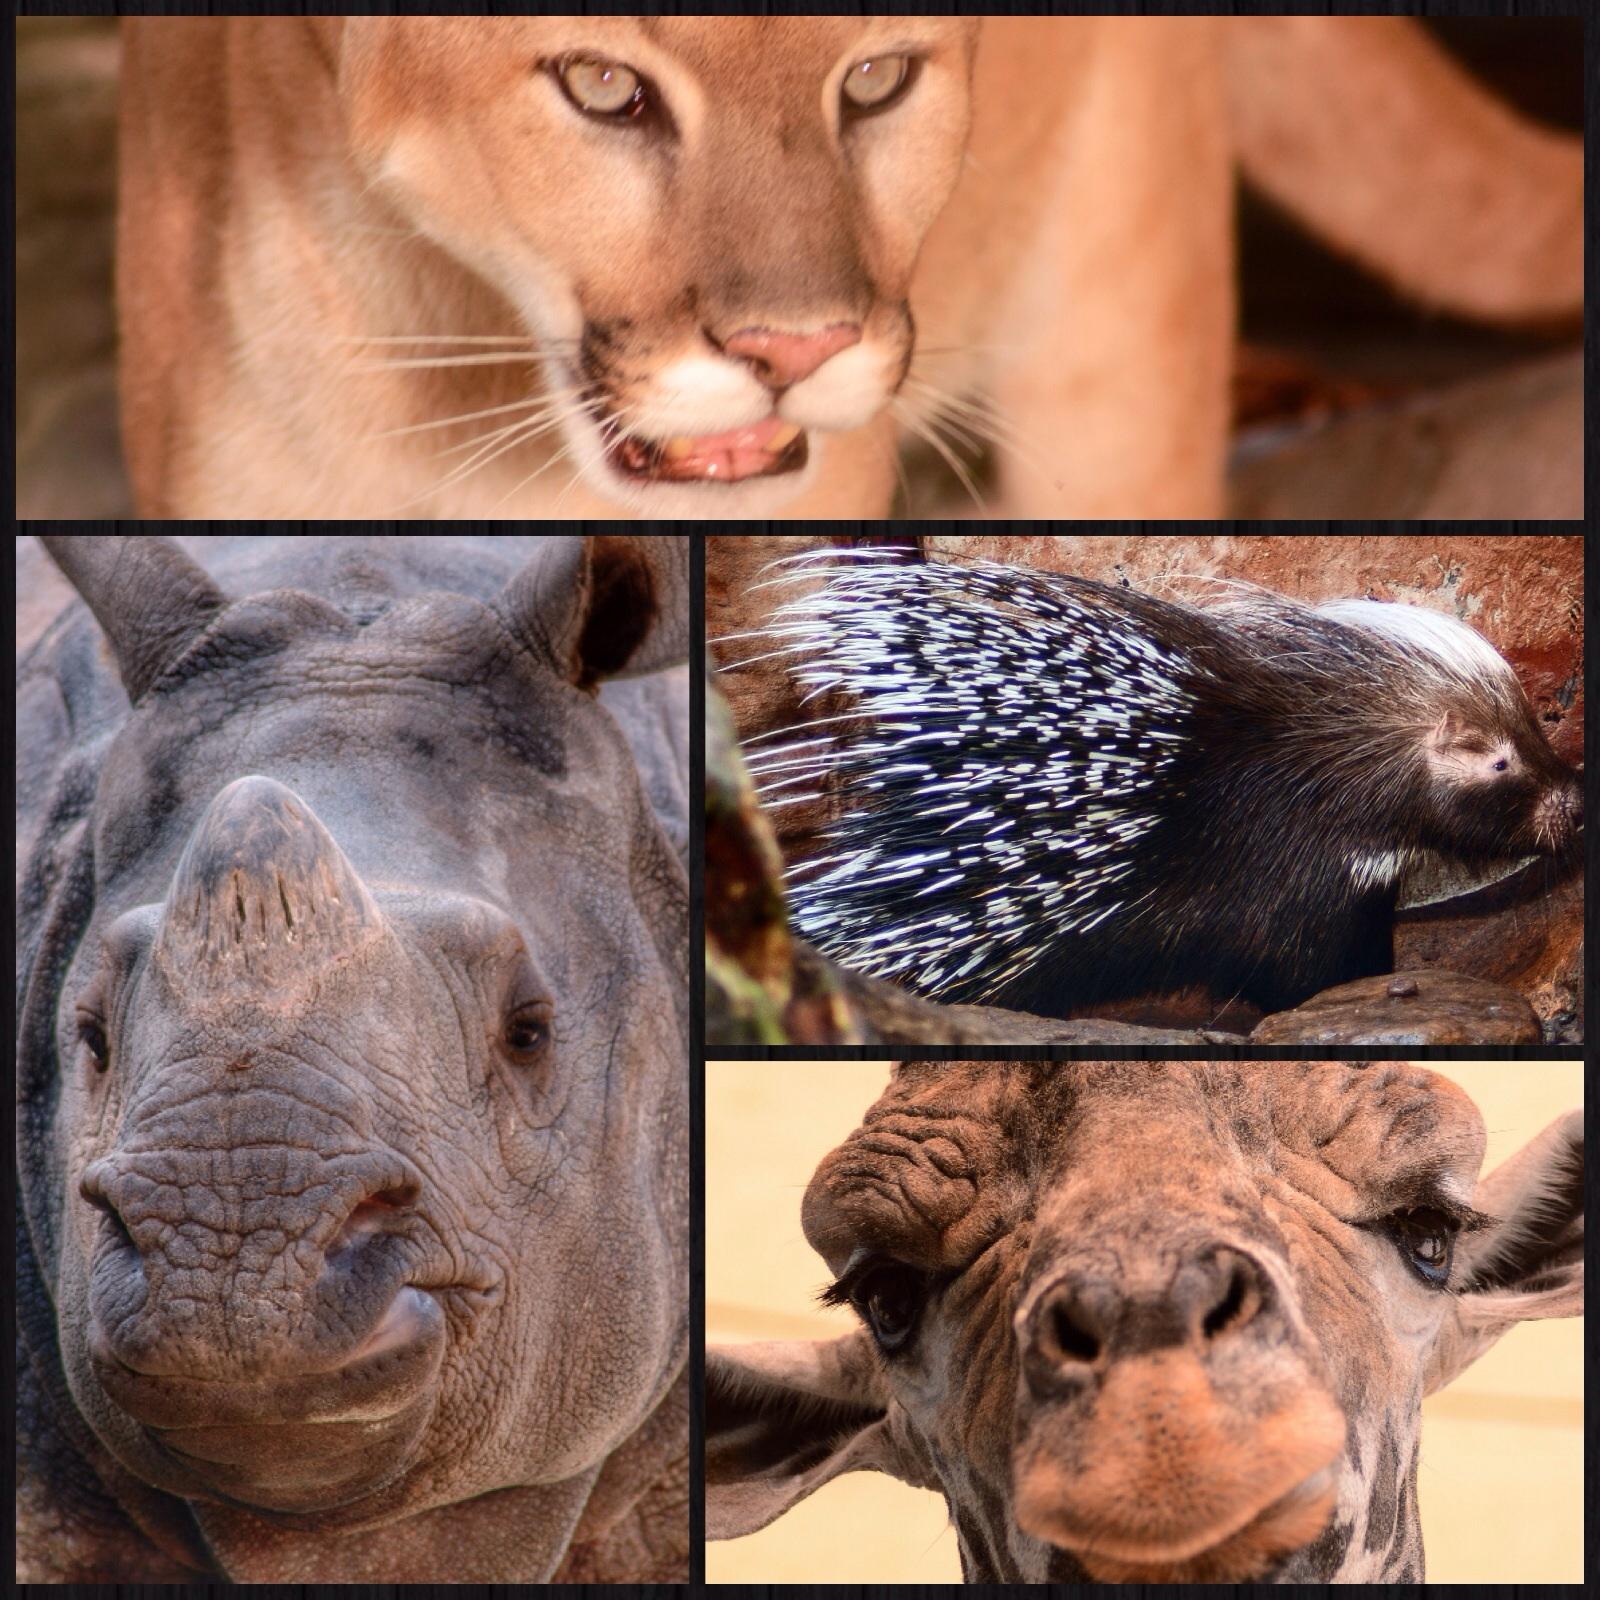 Cougar, Indian Rhino, Porcupine, and Giraffe